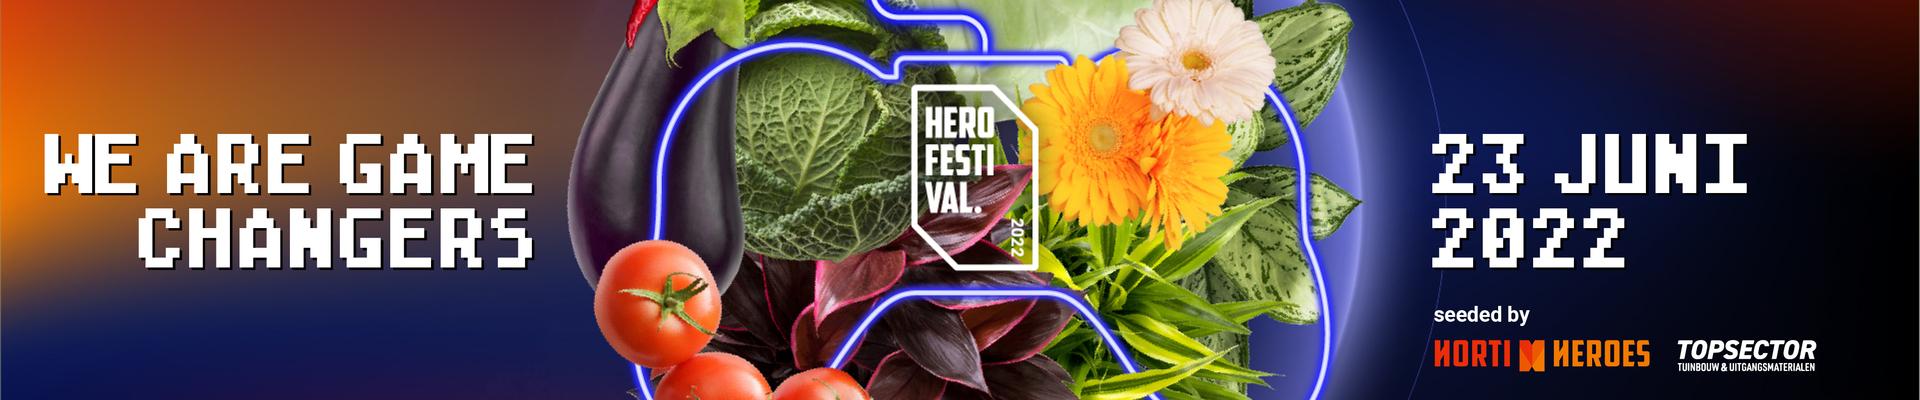 HeroFestival | 8 juli 2021